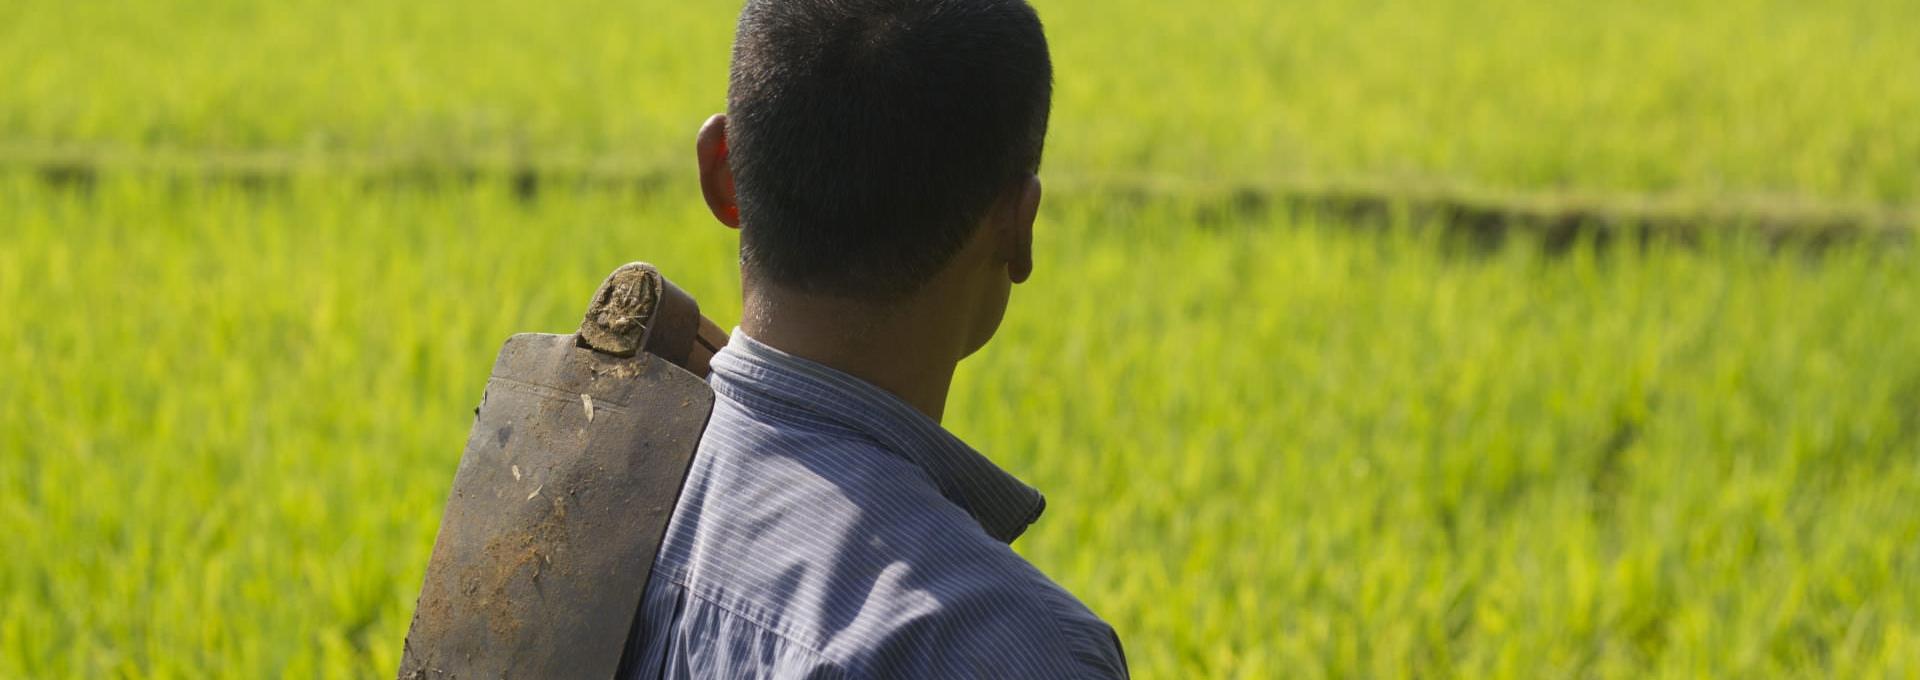 Indonesian suku puoli videot